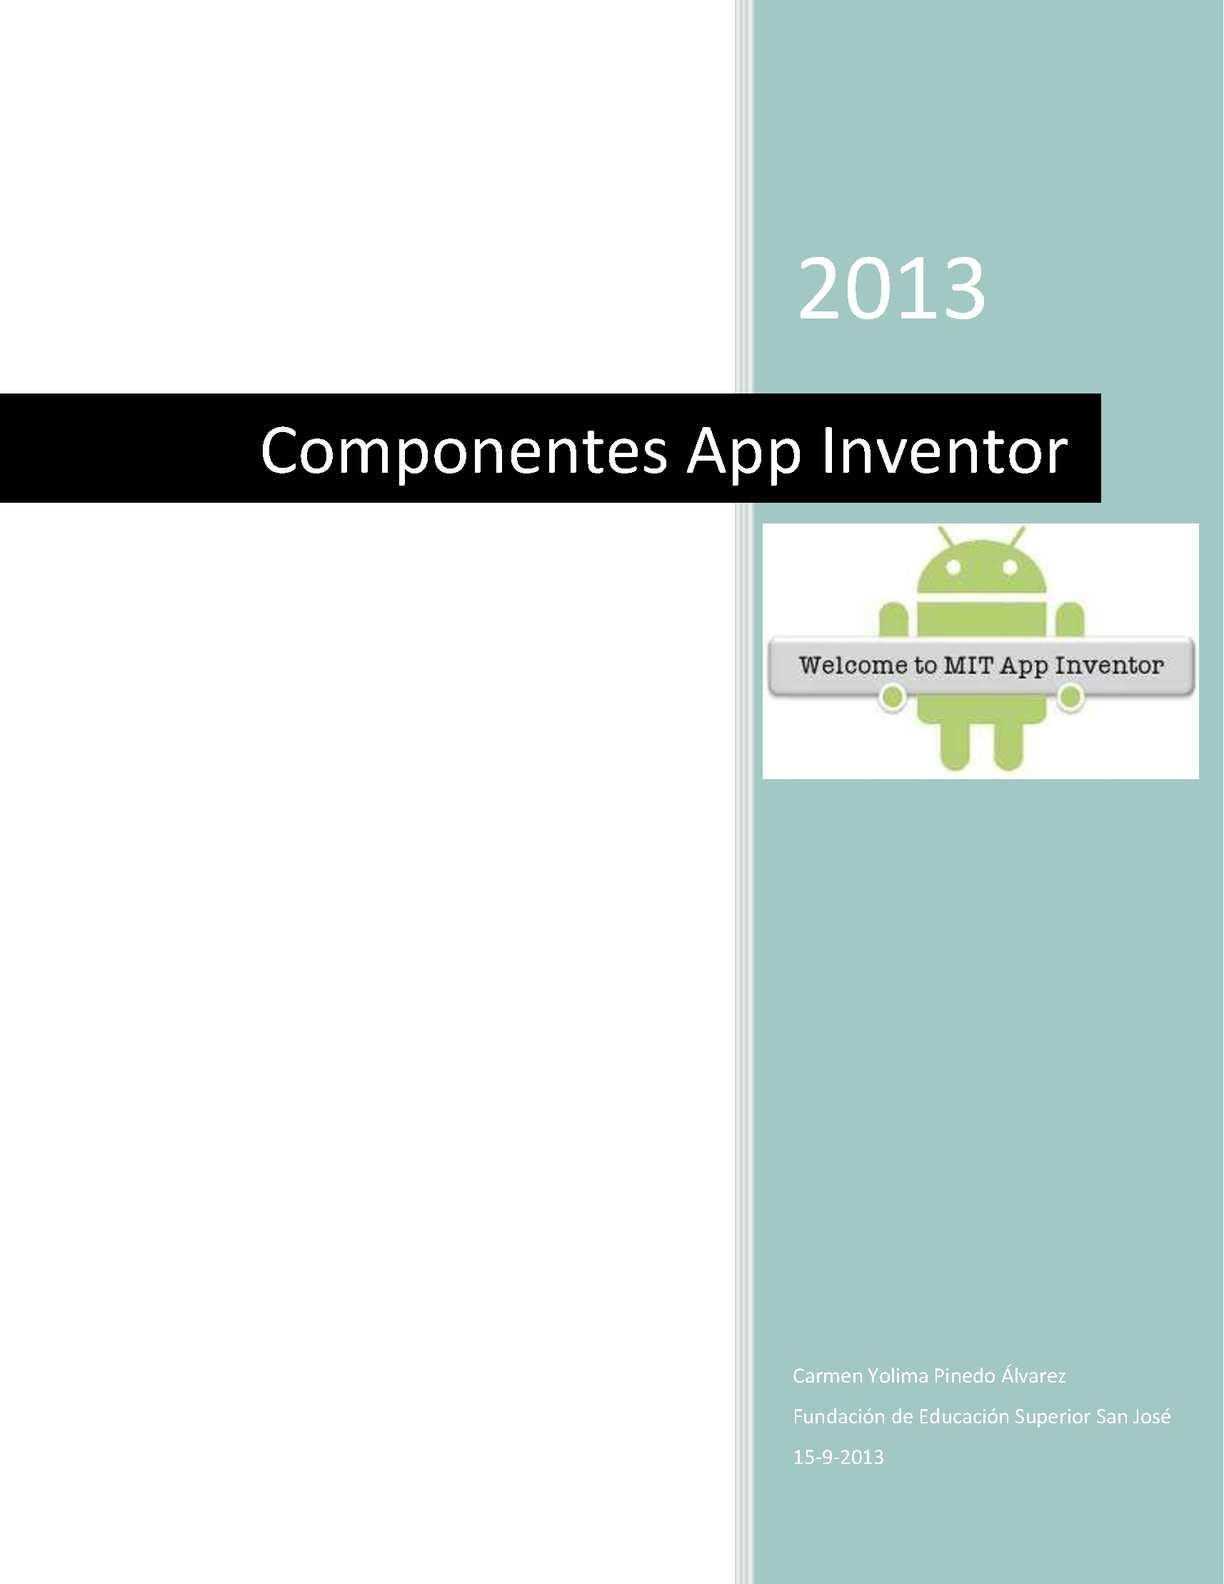 Componentes App Inventor